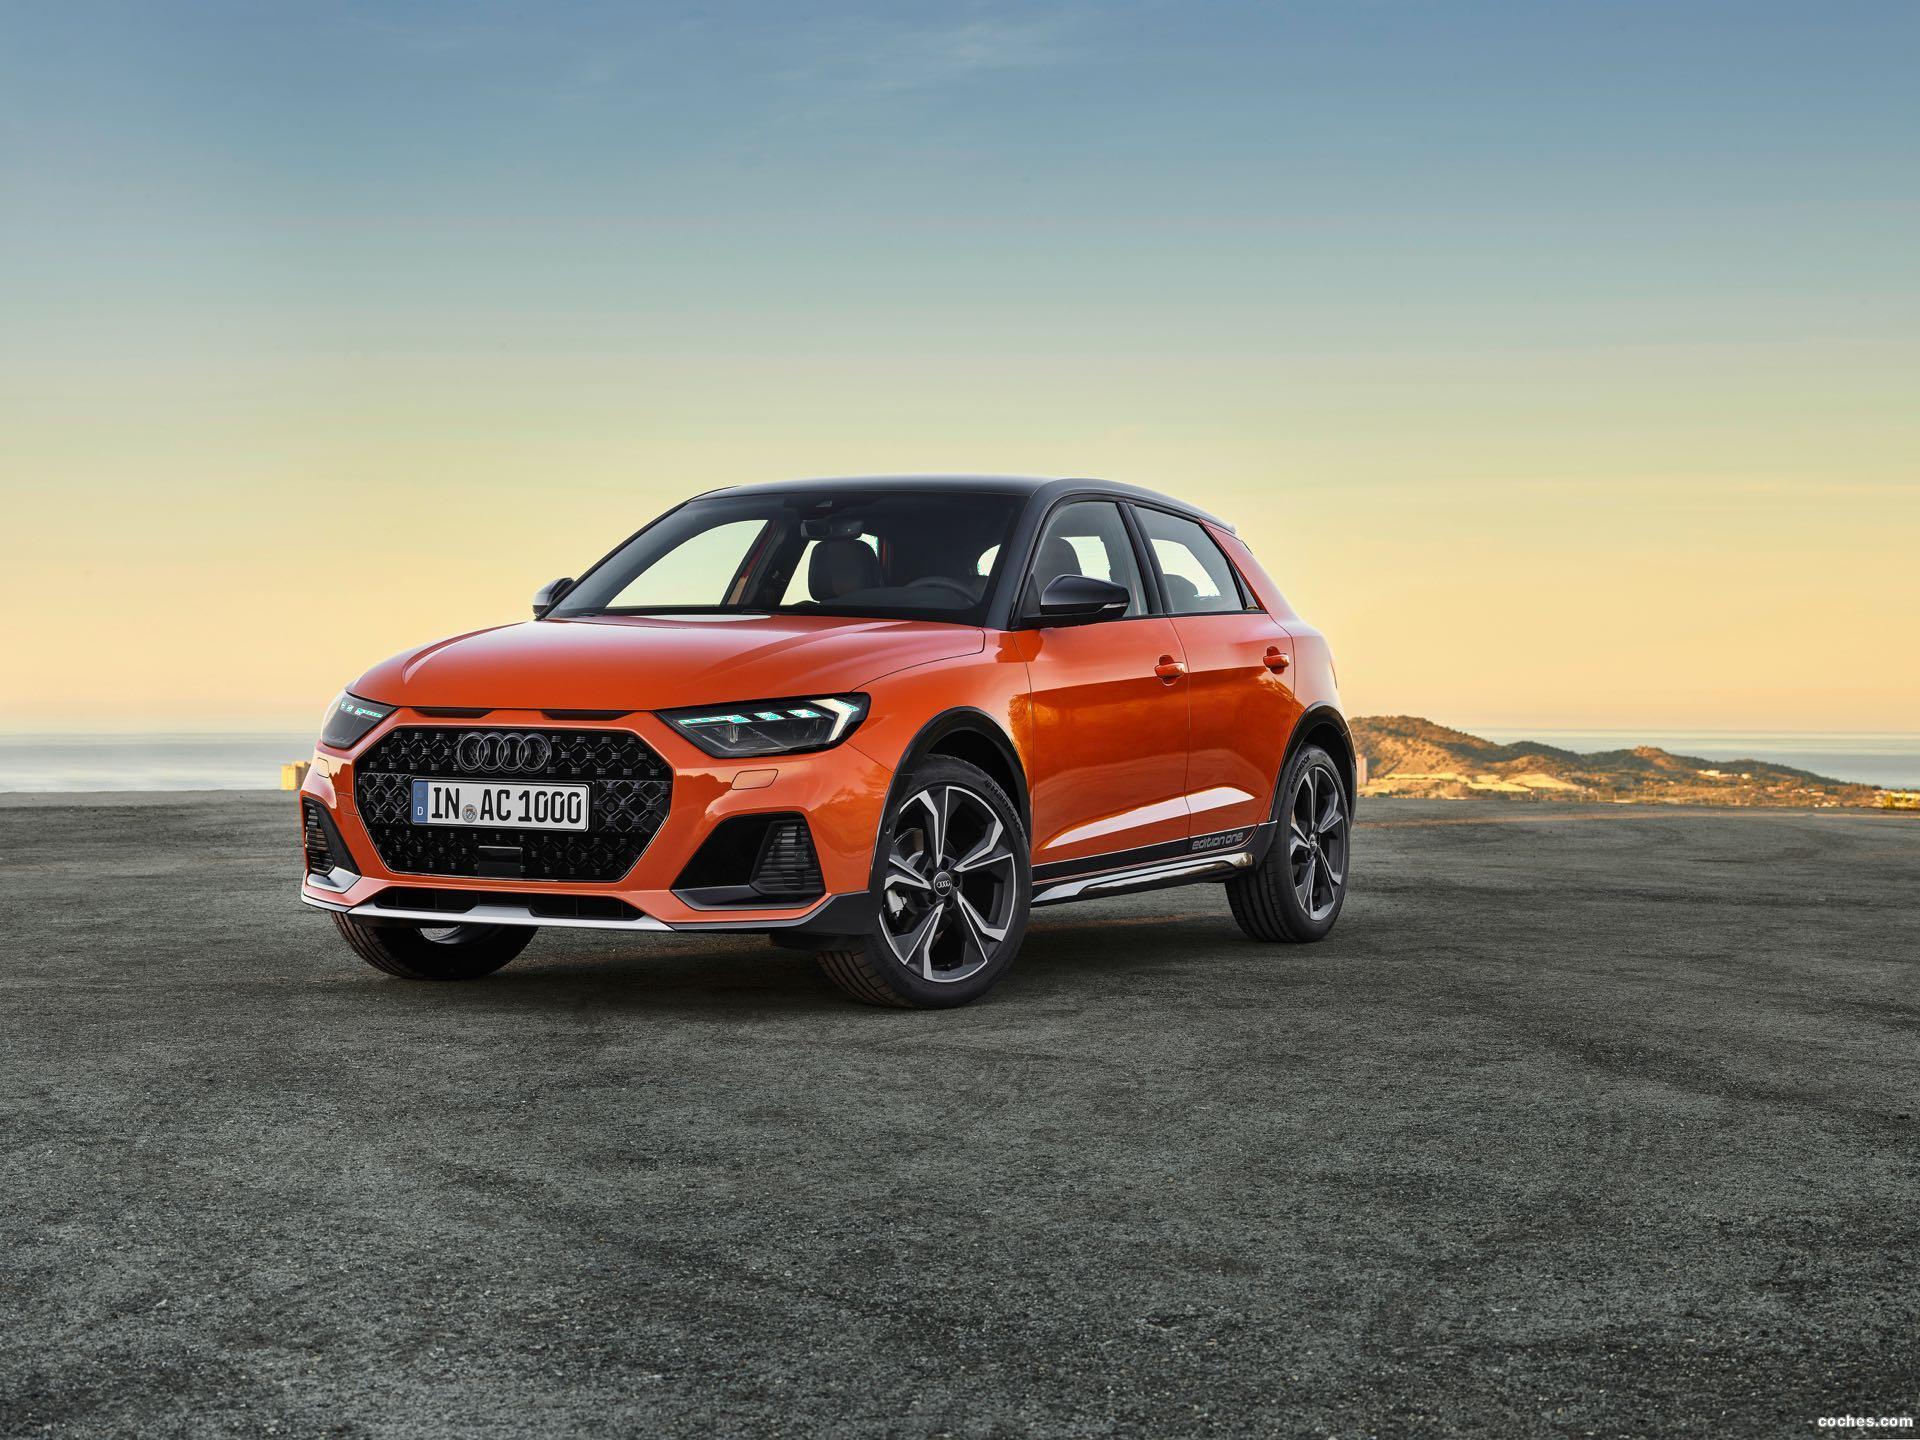 Foto 6 de Audi A1 Citycarver 2019